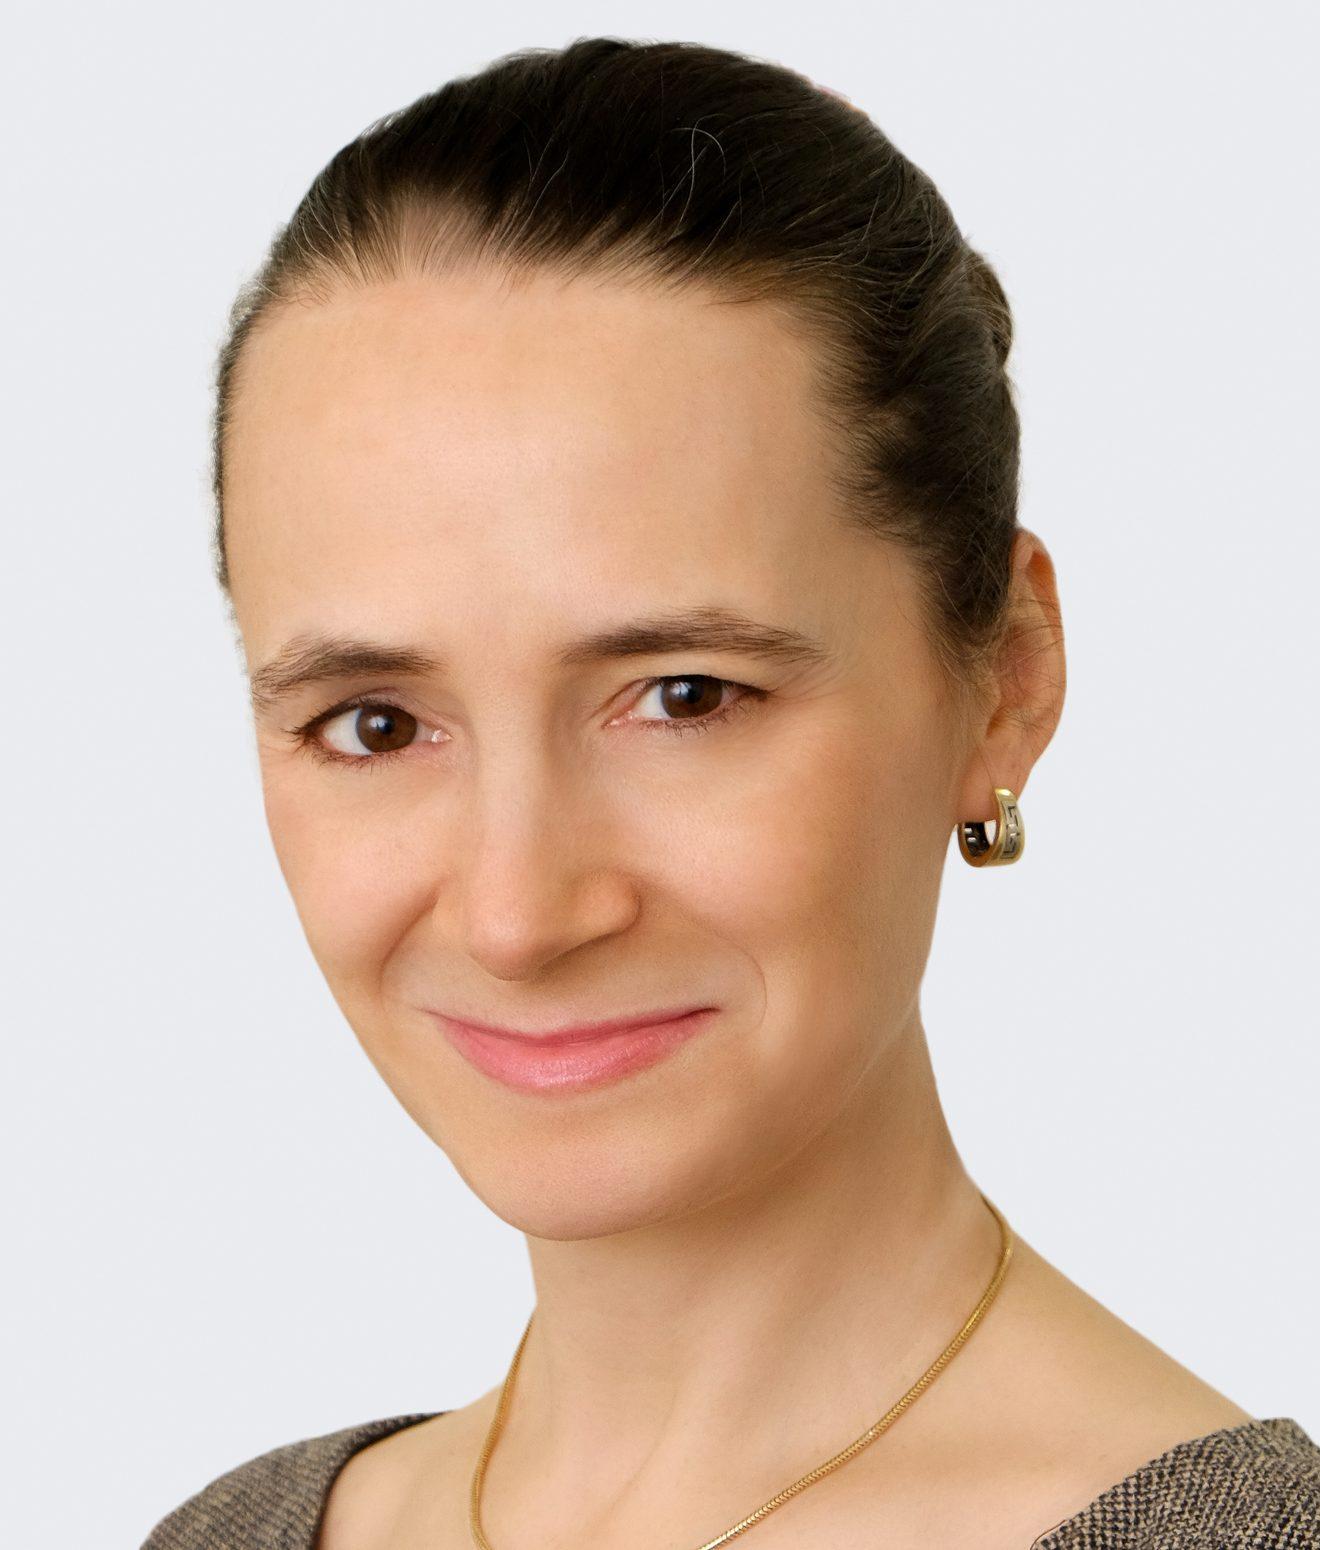 Prof. Jessica James